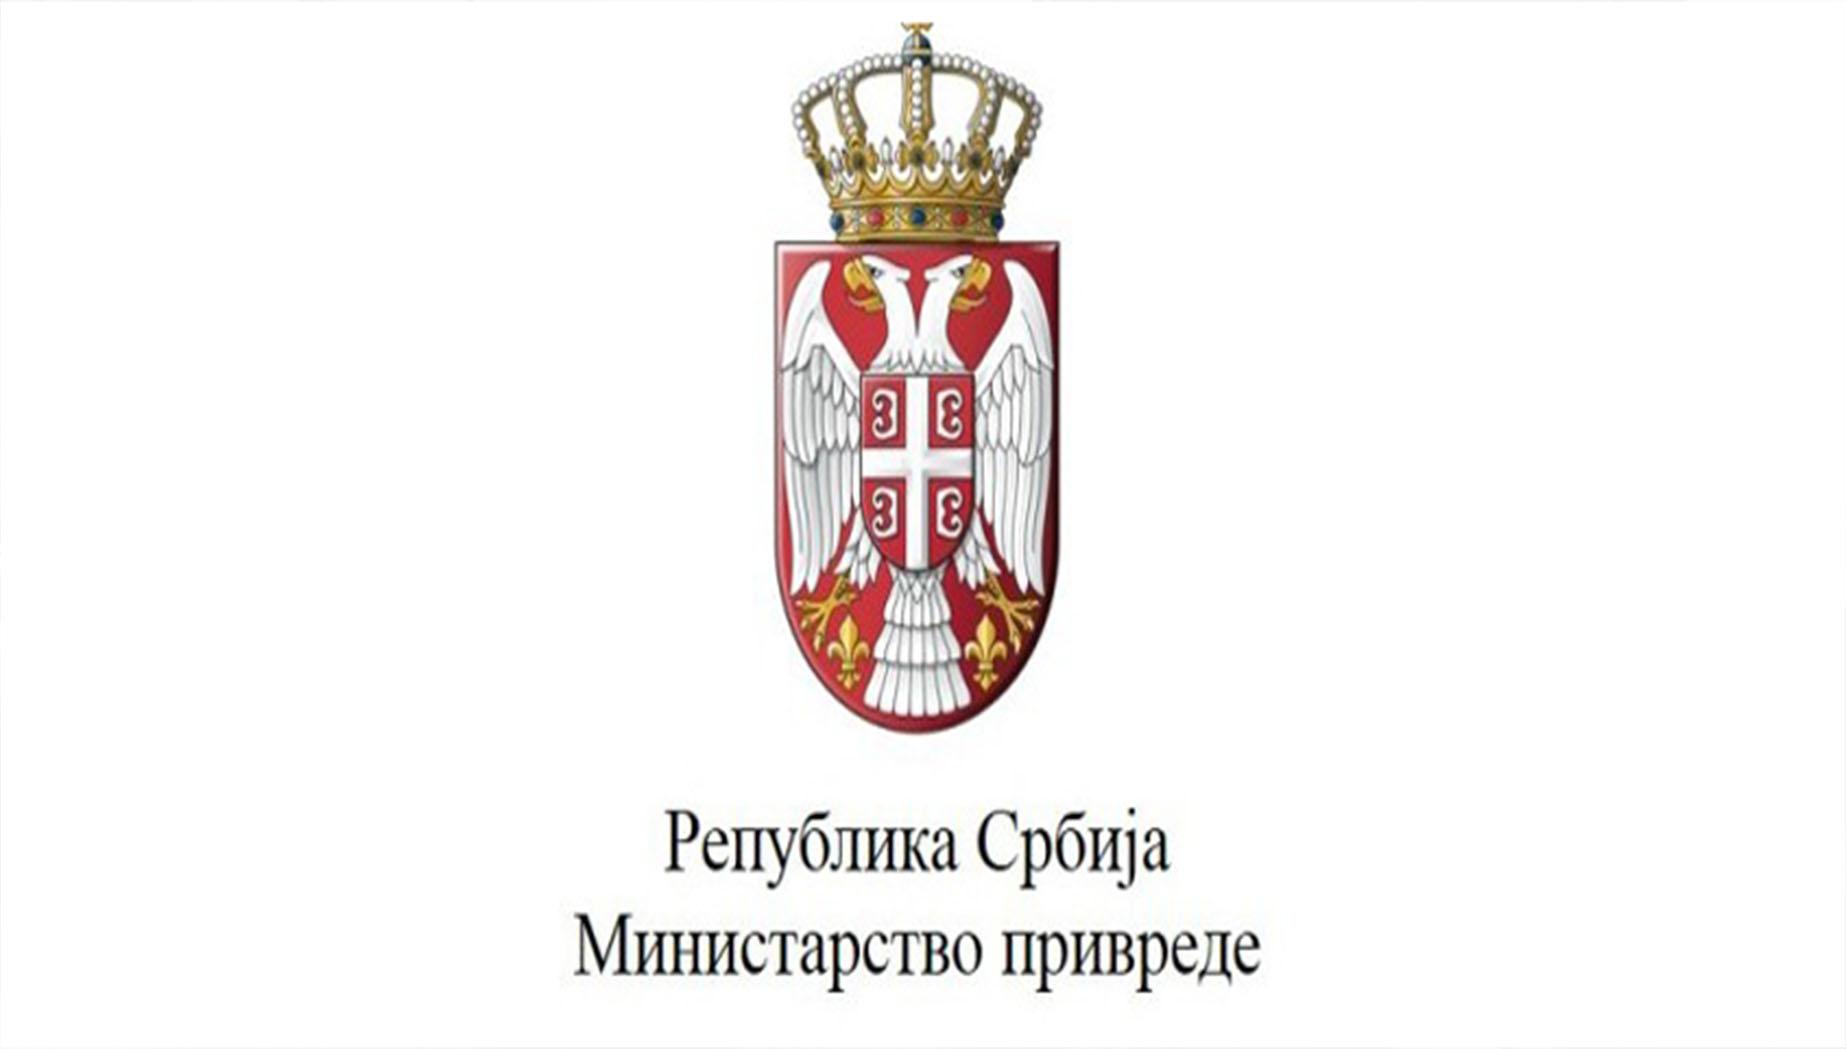 Министарство привреде